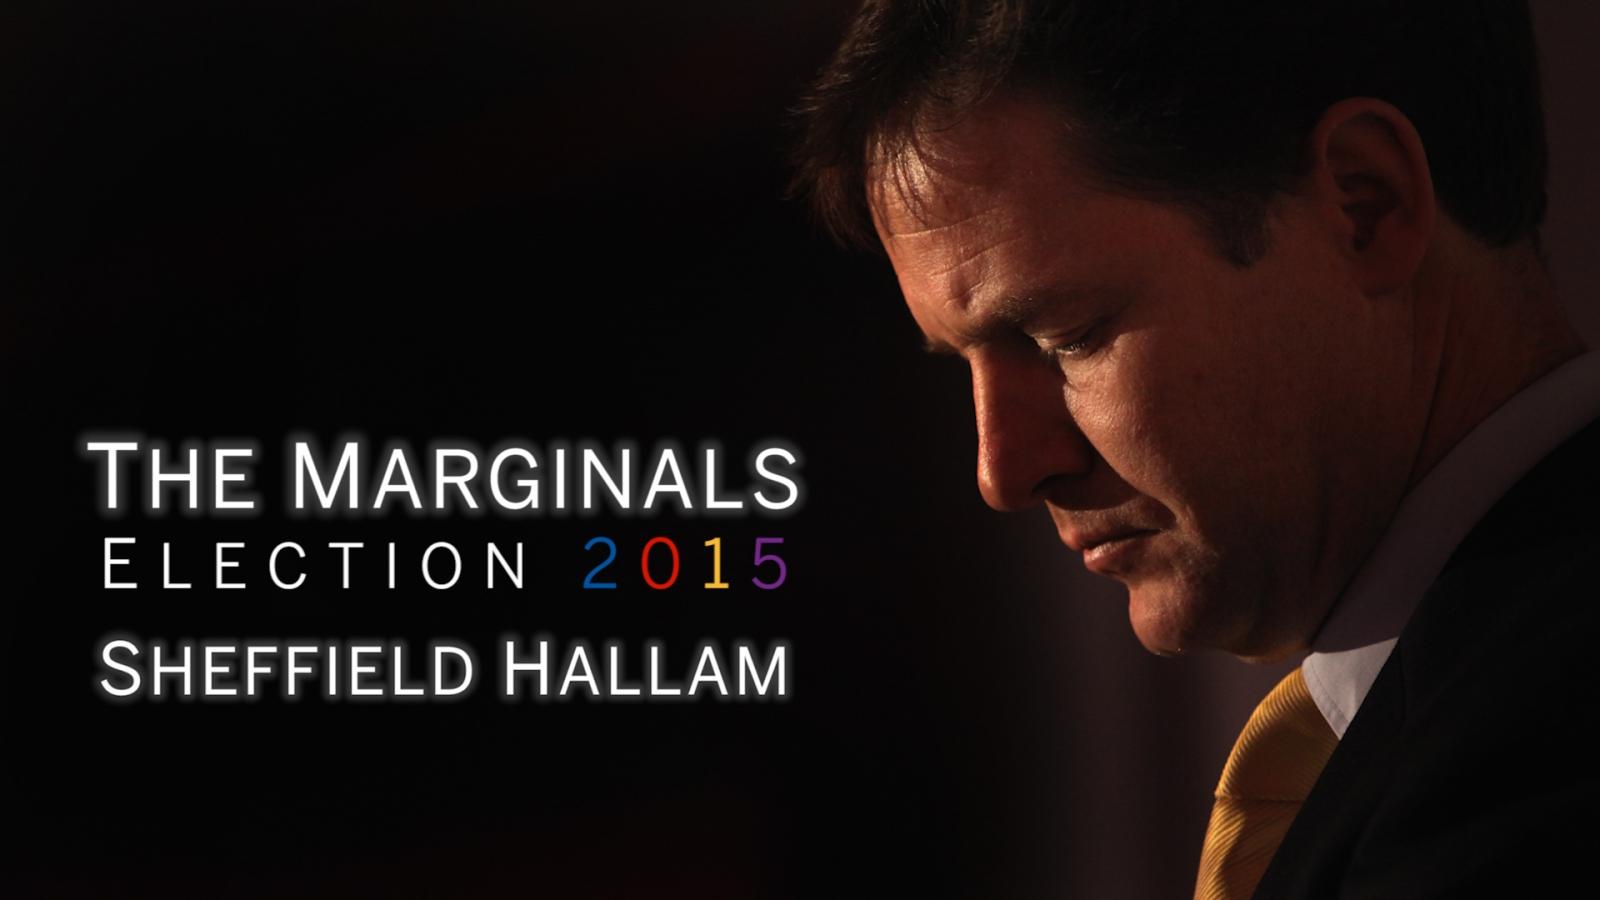 The Marginals Sheffield Hallam cover photo